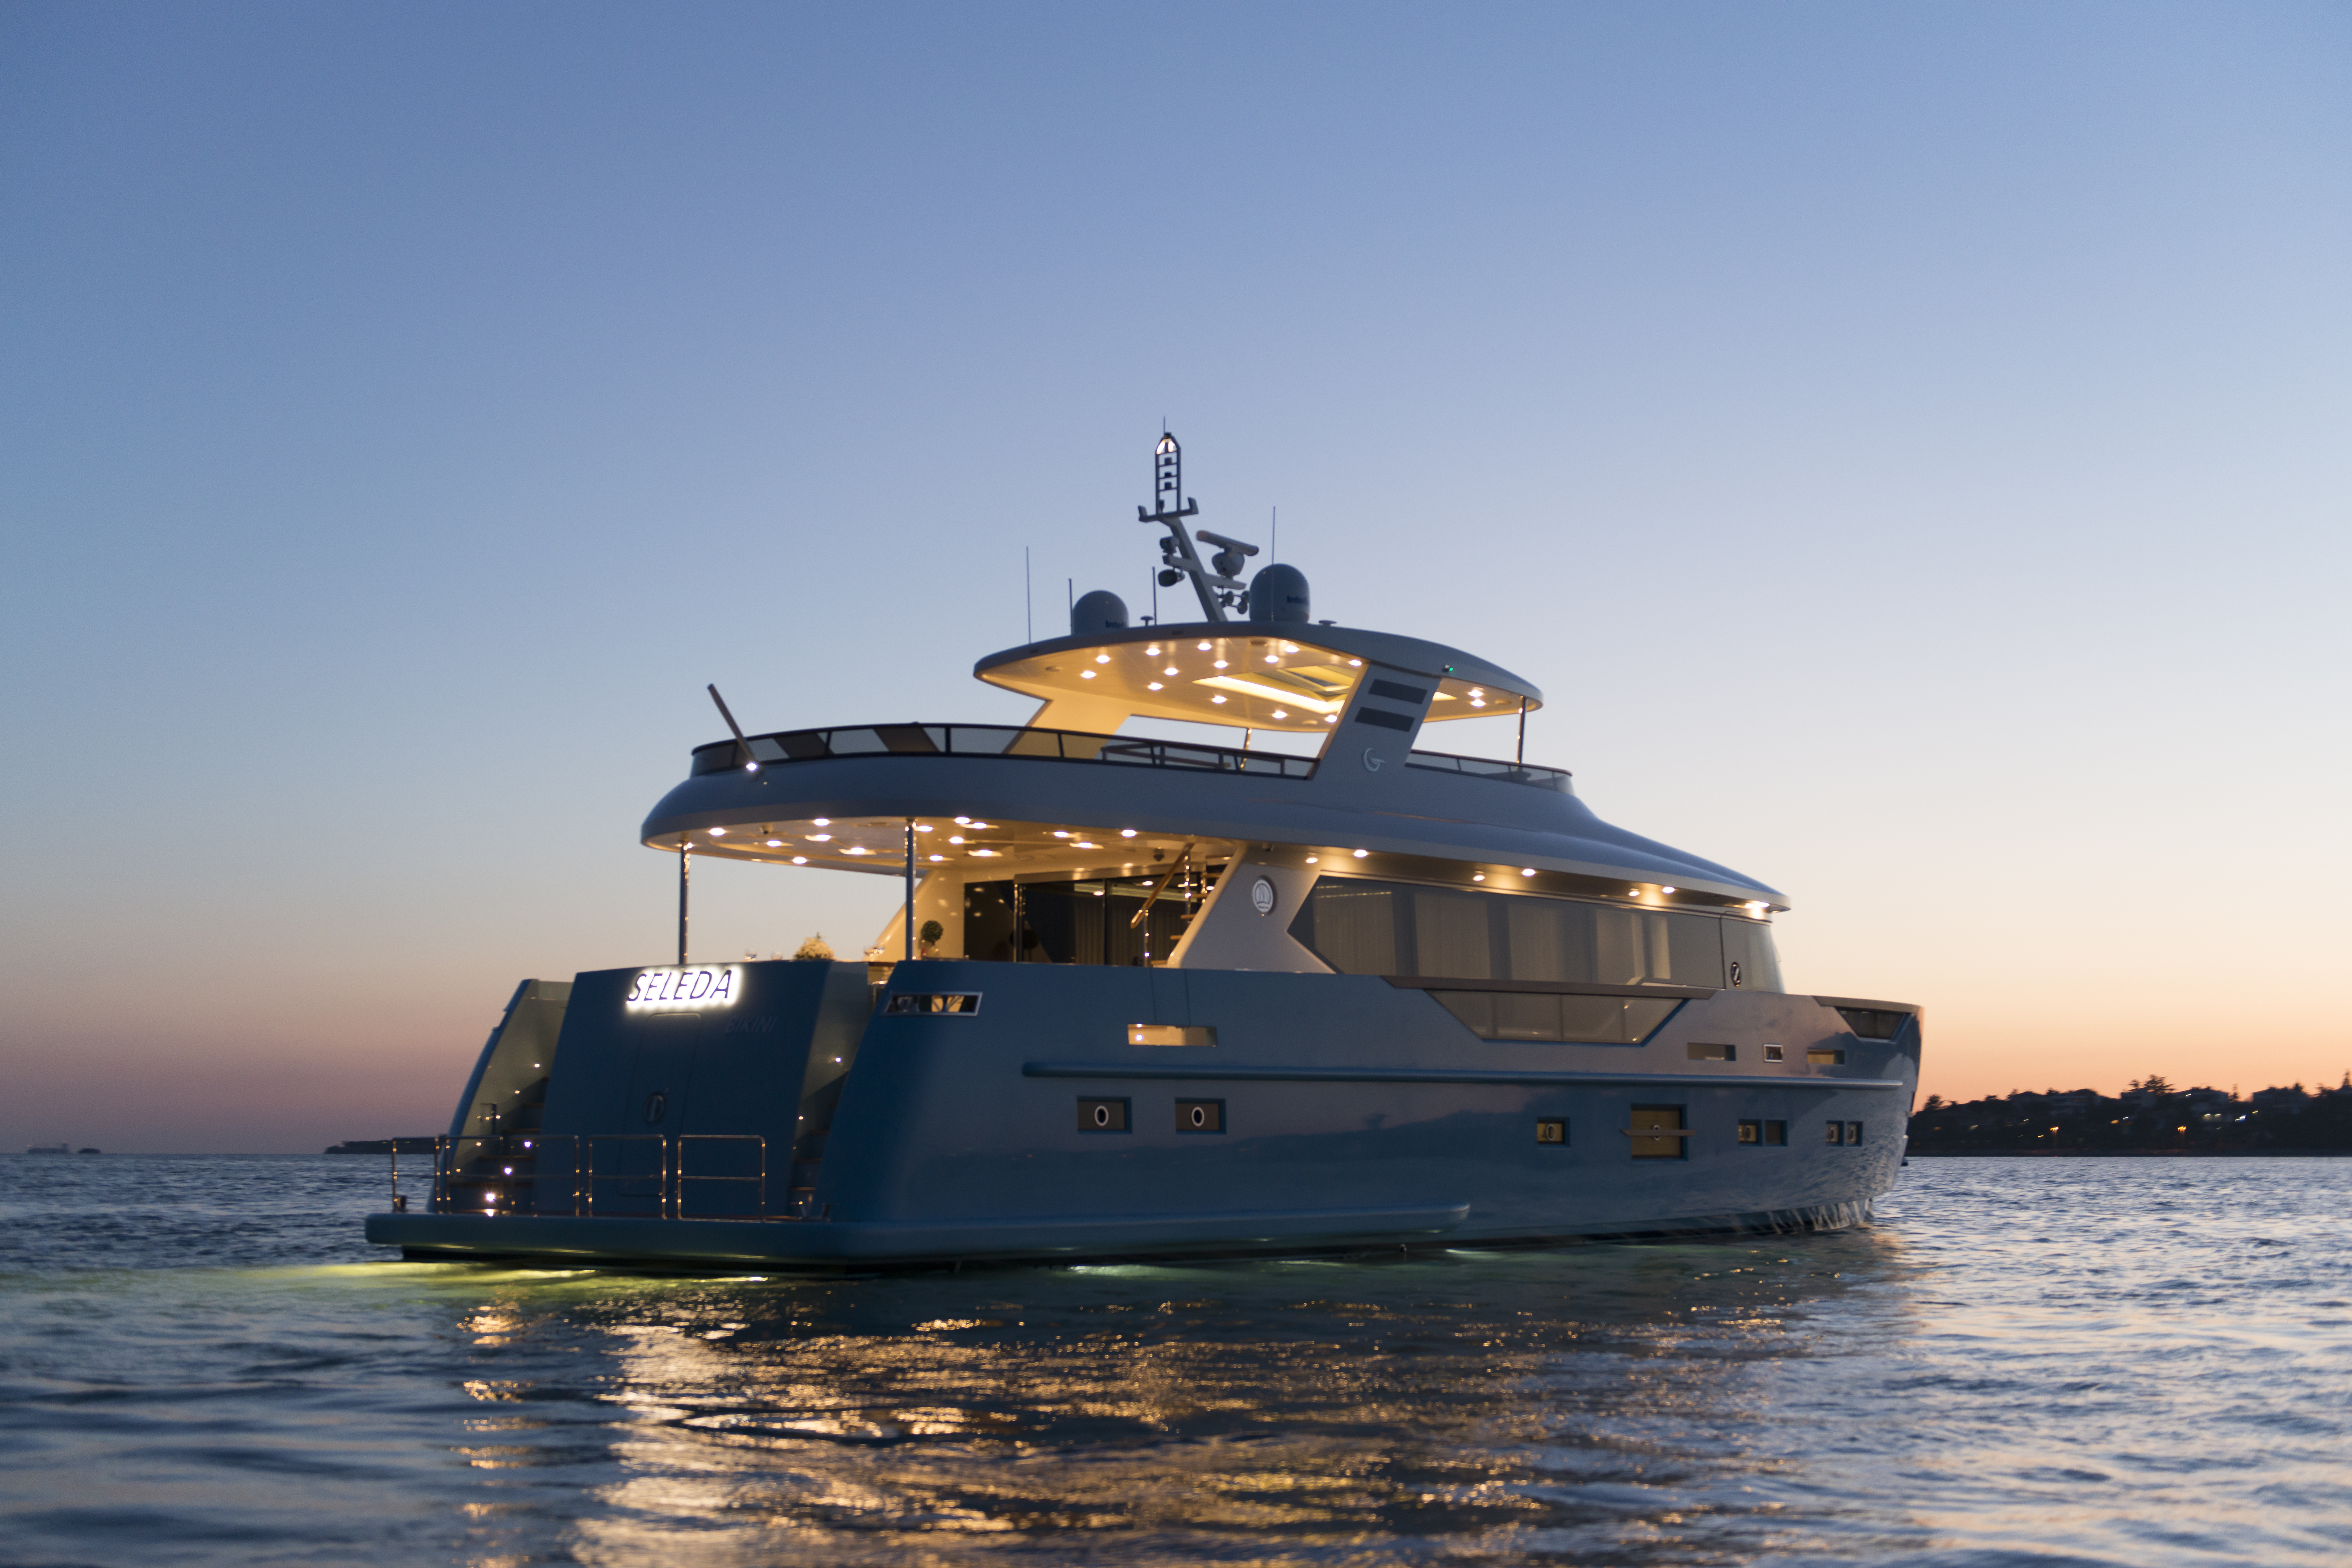 Mengi Yay Yachts - Seleda